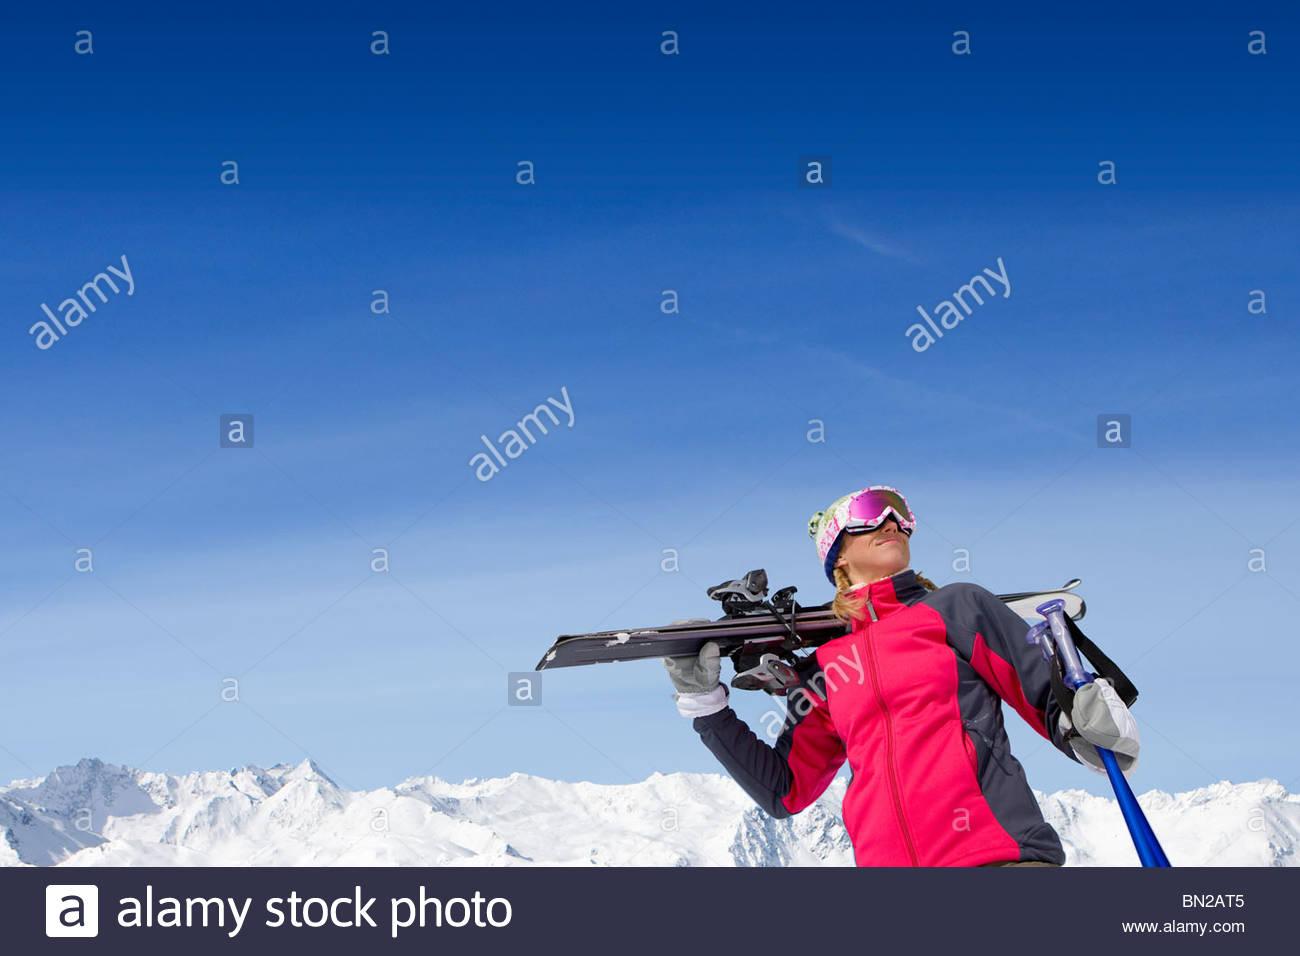 Woman holding skis and ski poles on snowy mountain - Stock Image